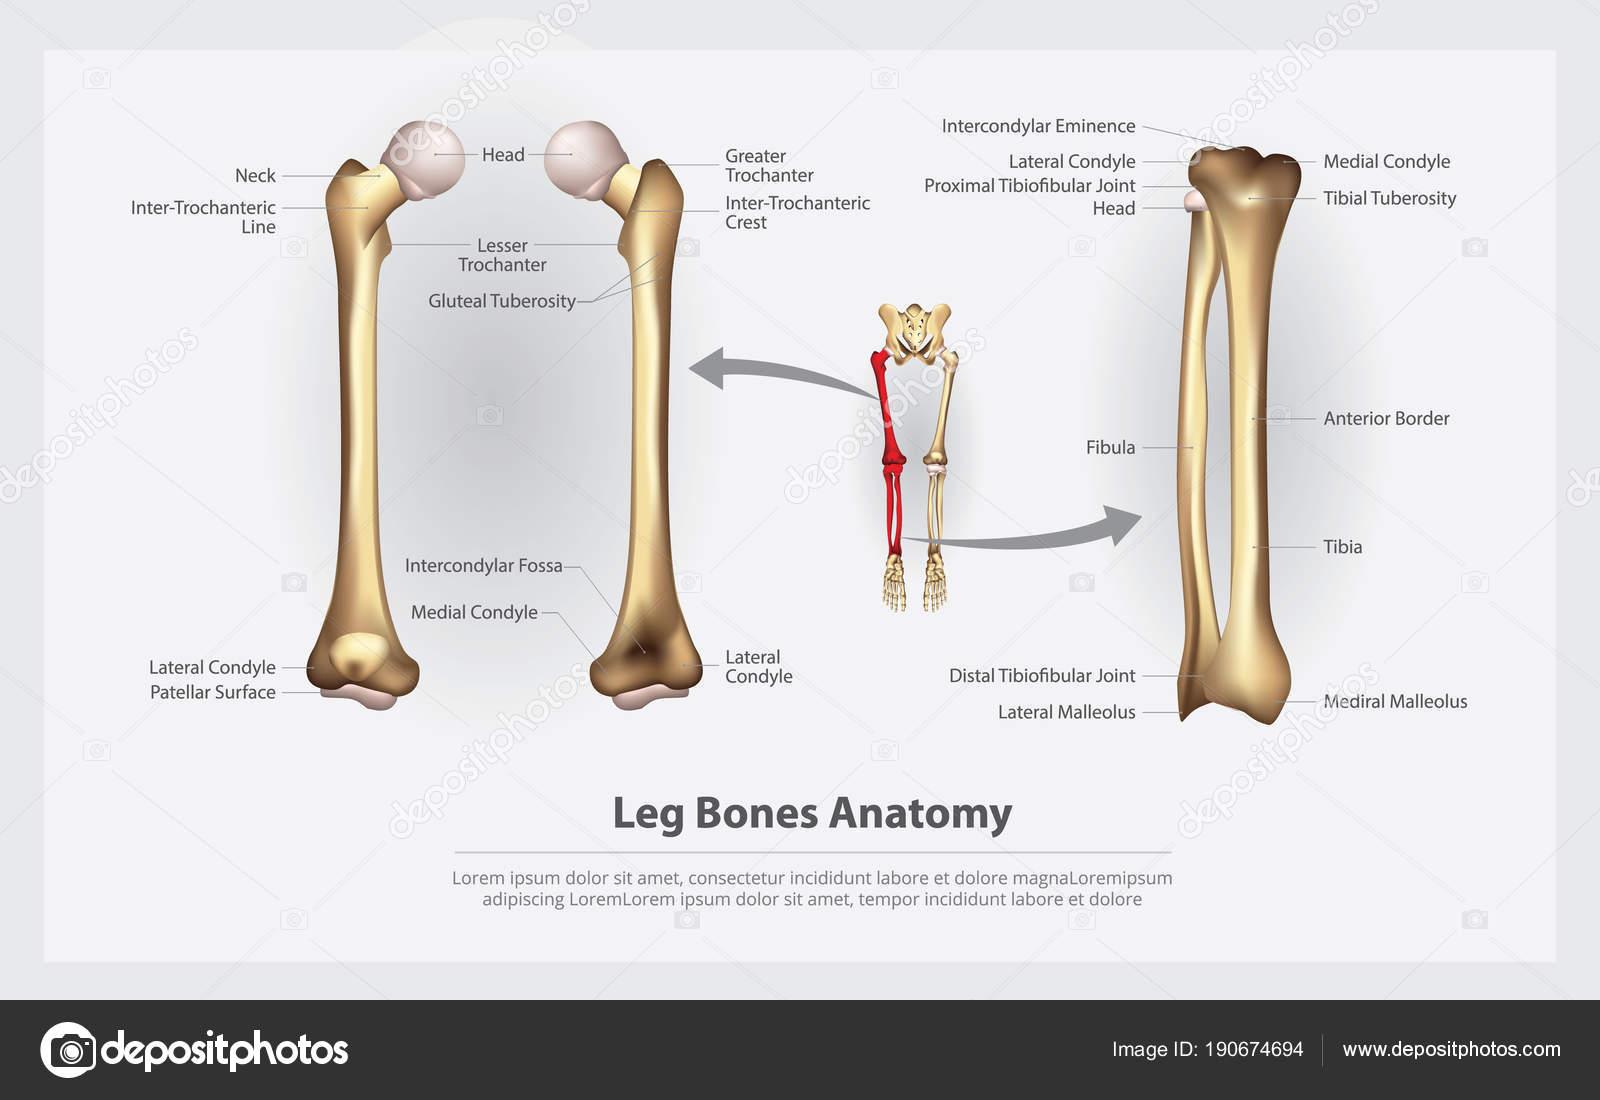 Anatomía Pierna Huesos Con Detalle Vector Ilustración — Vector de ...